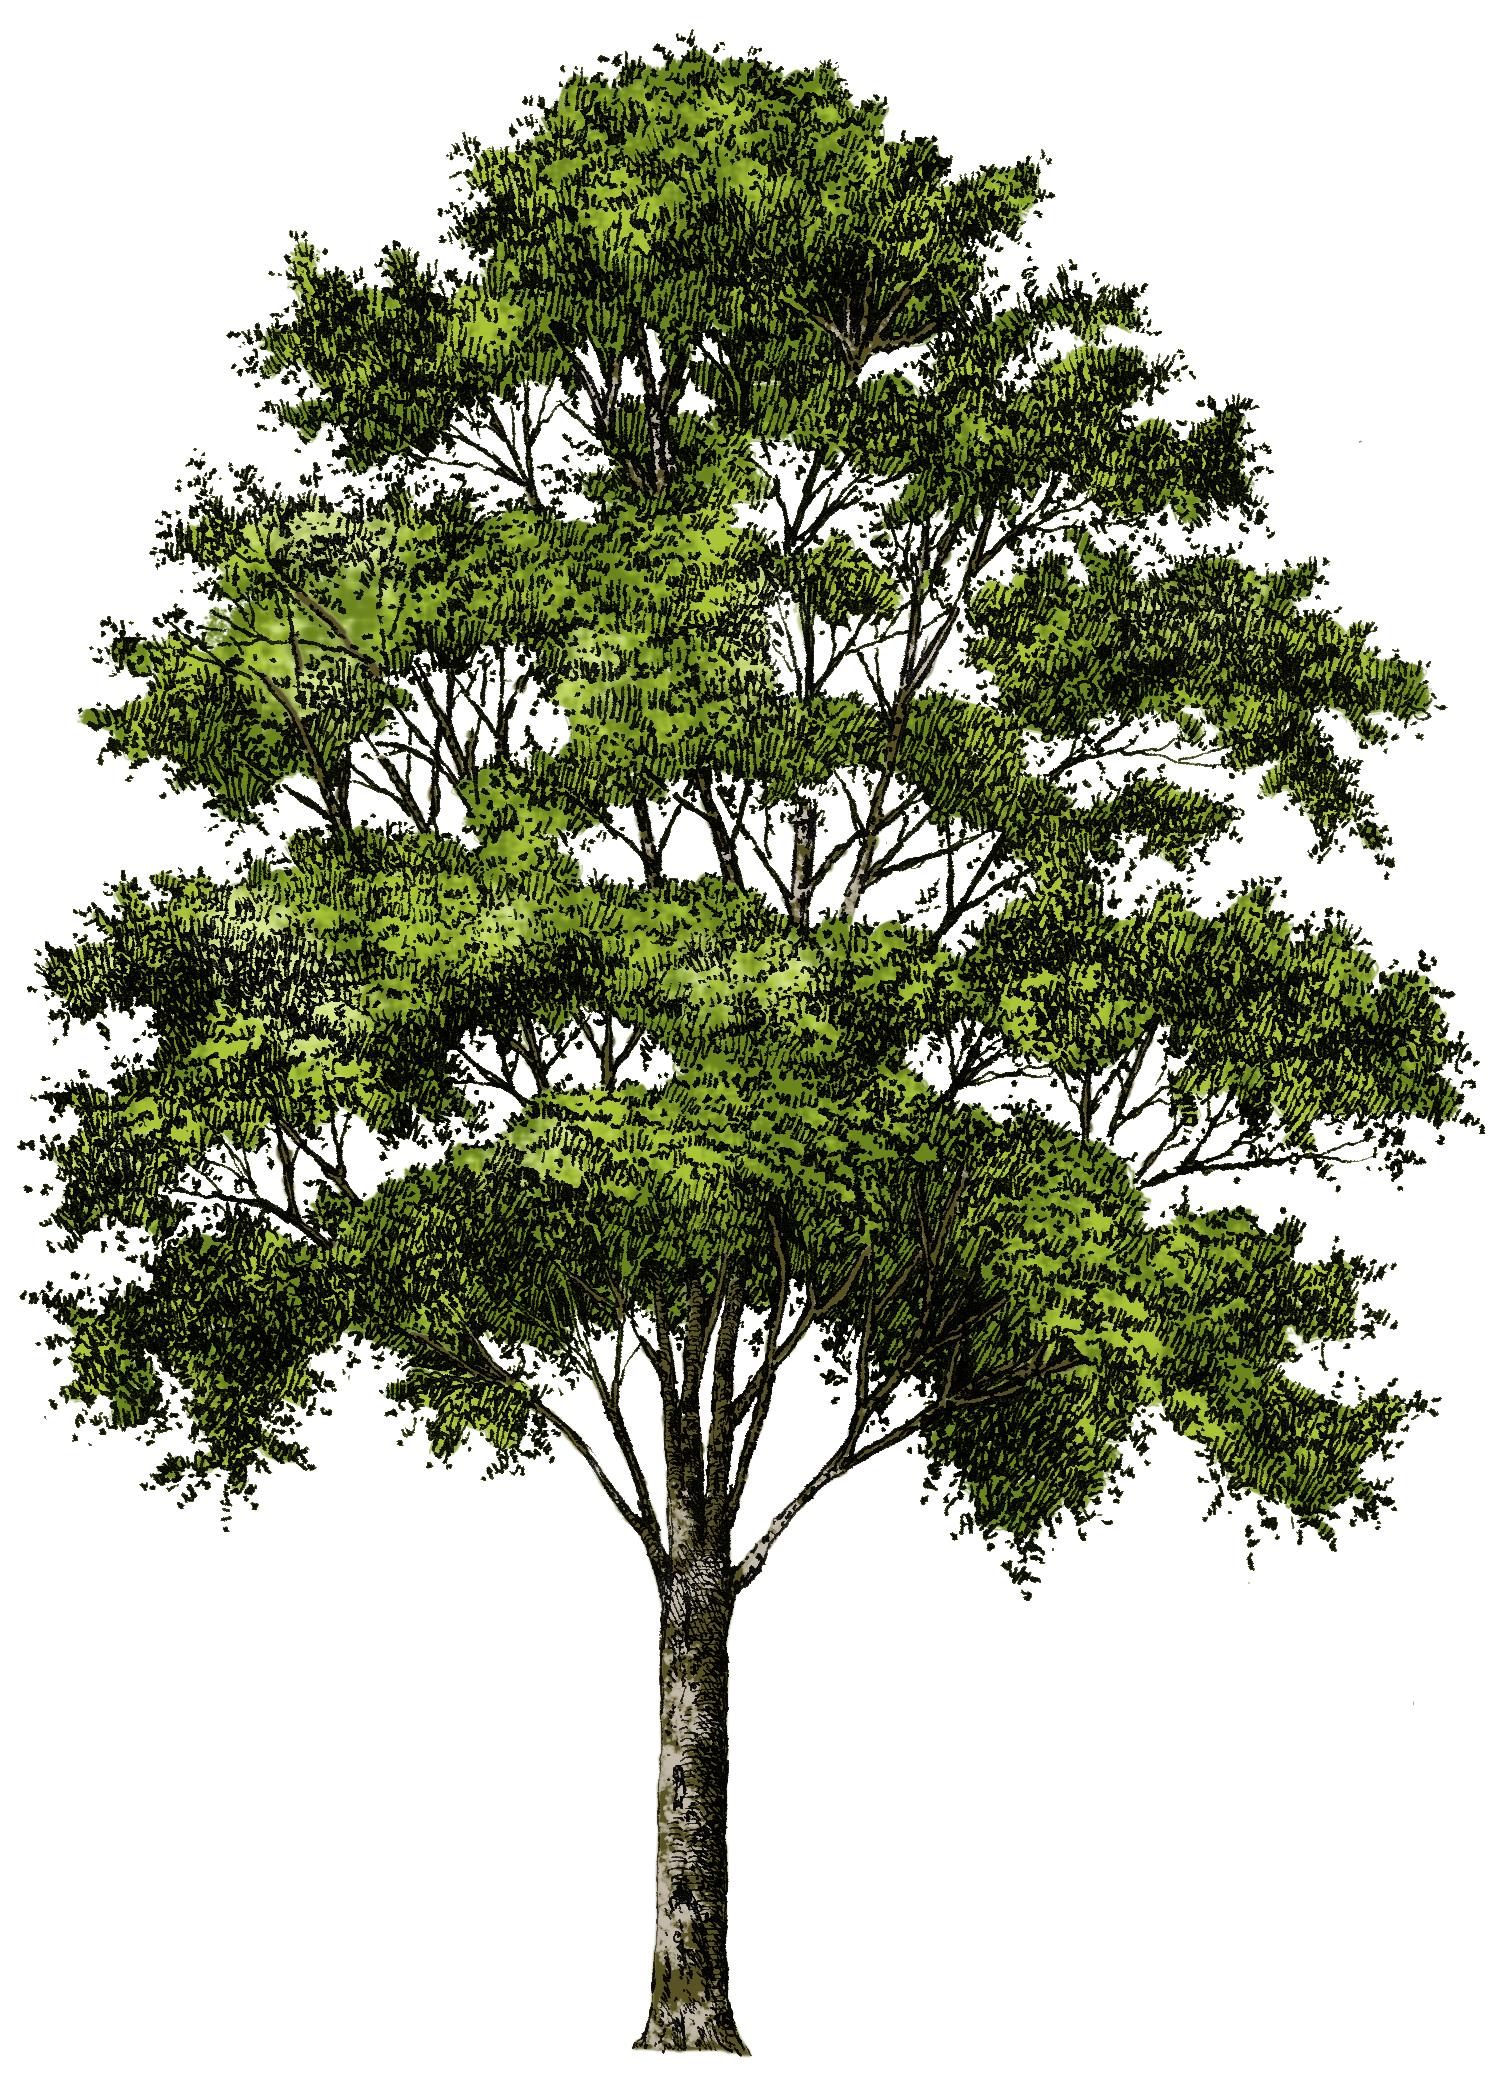 Pin by Michele Siliprandi on dwg o cad | Tree photoshop